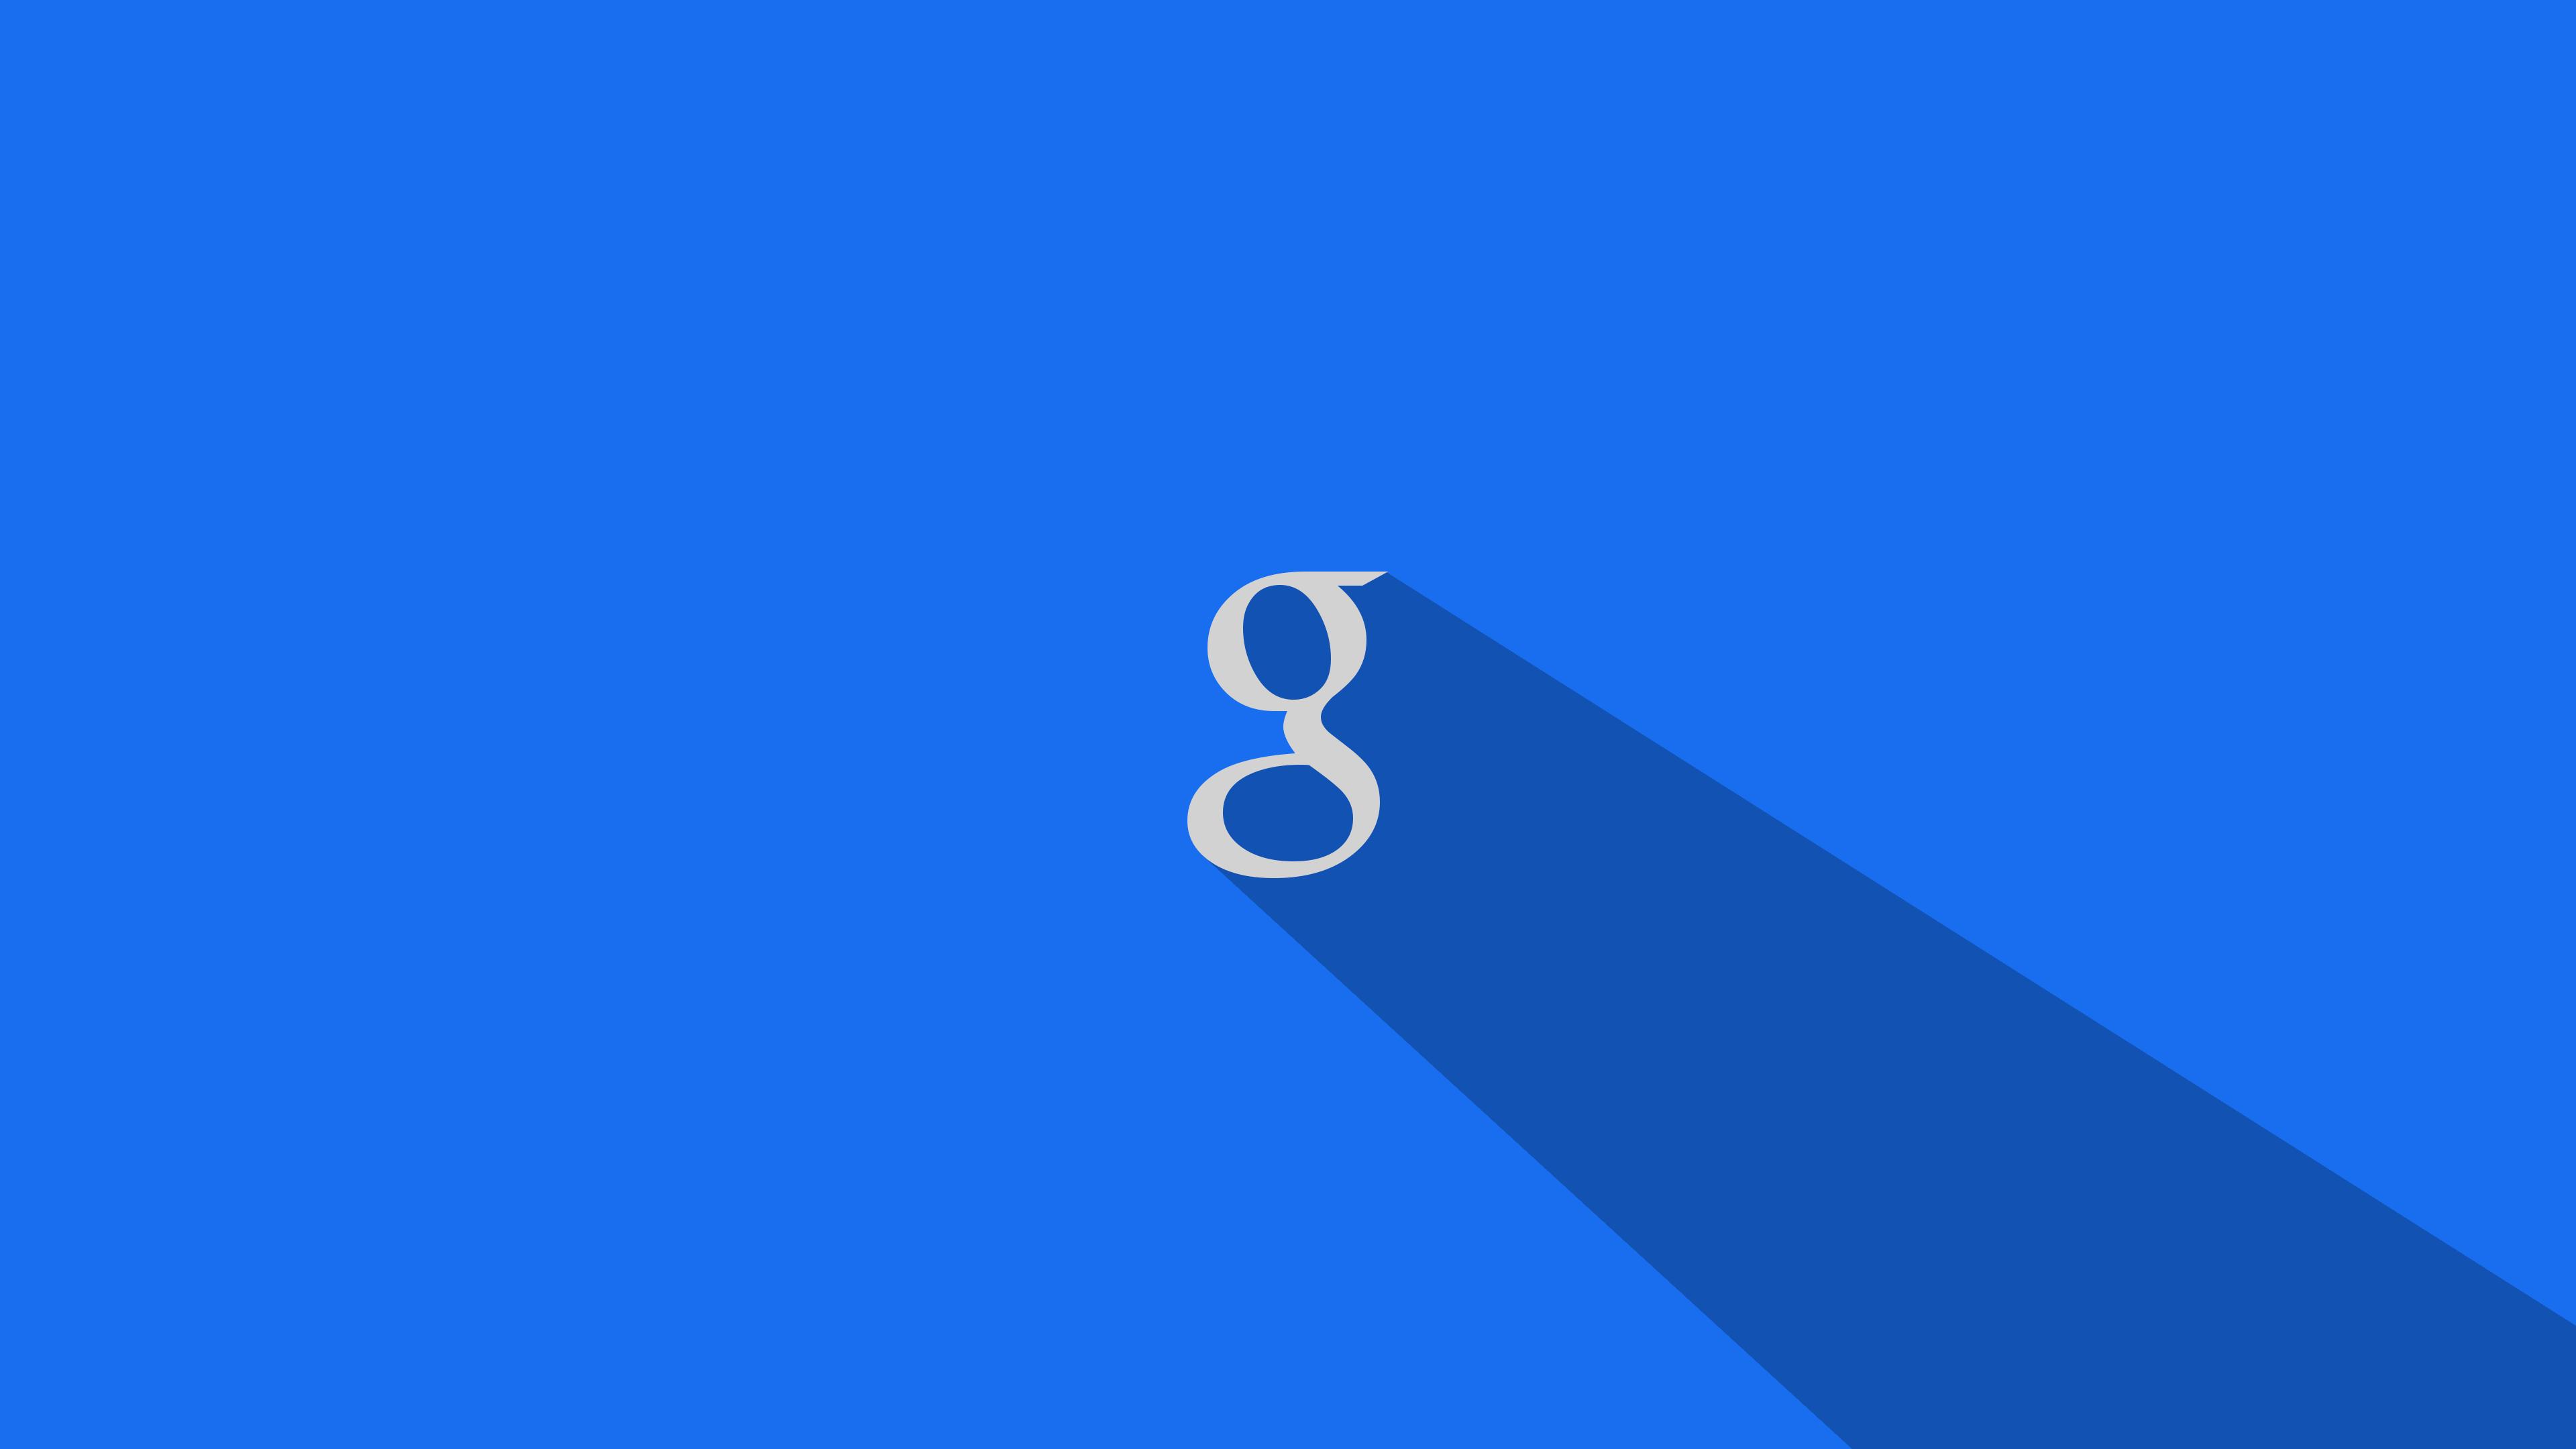 Google Wallpaper Desktop Background Am 998765   PNG Images   PNGio 3840x2160